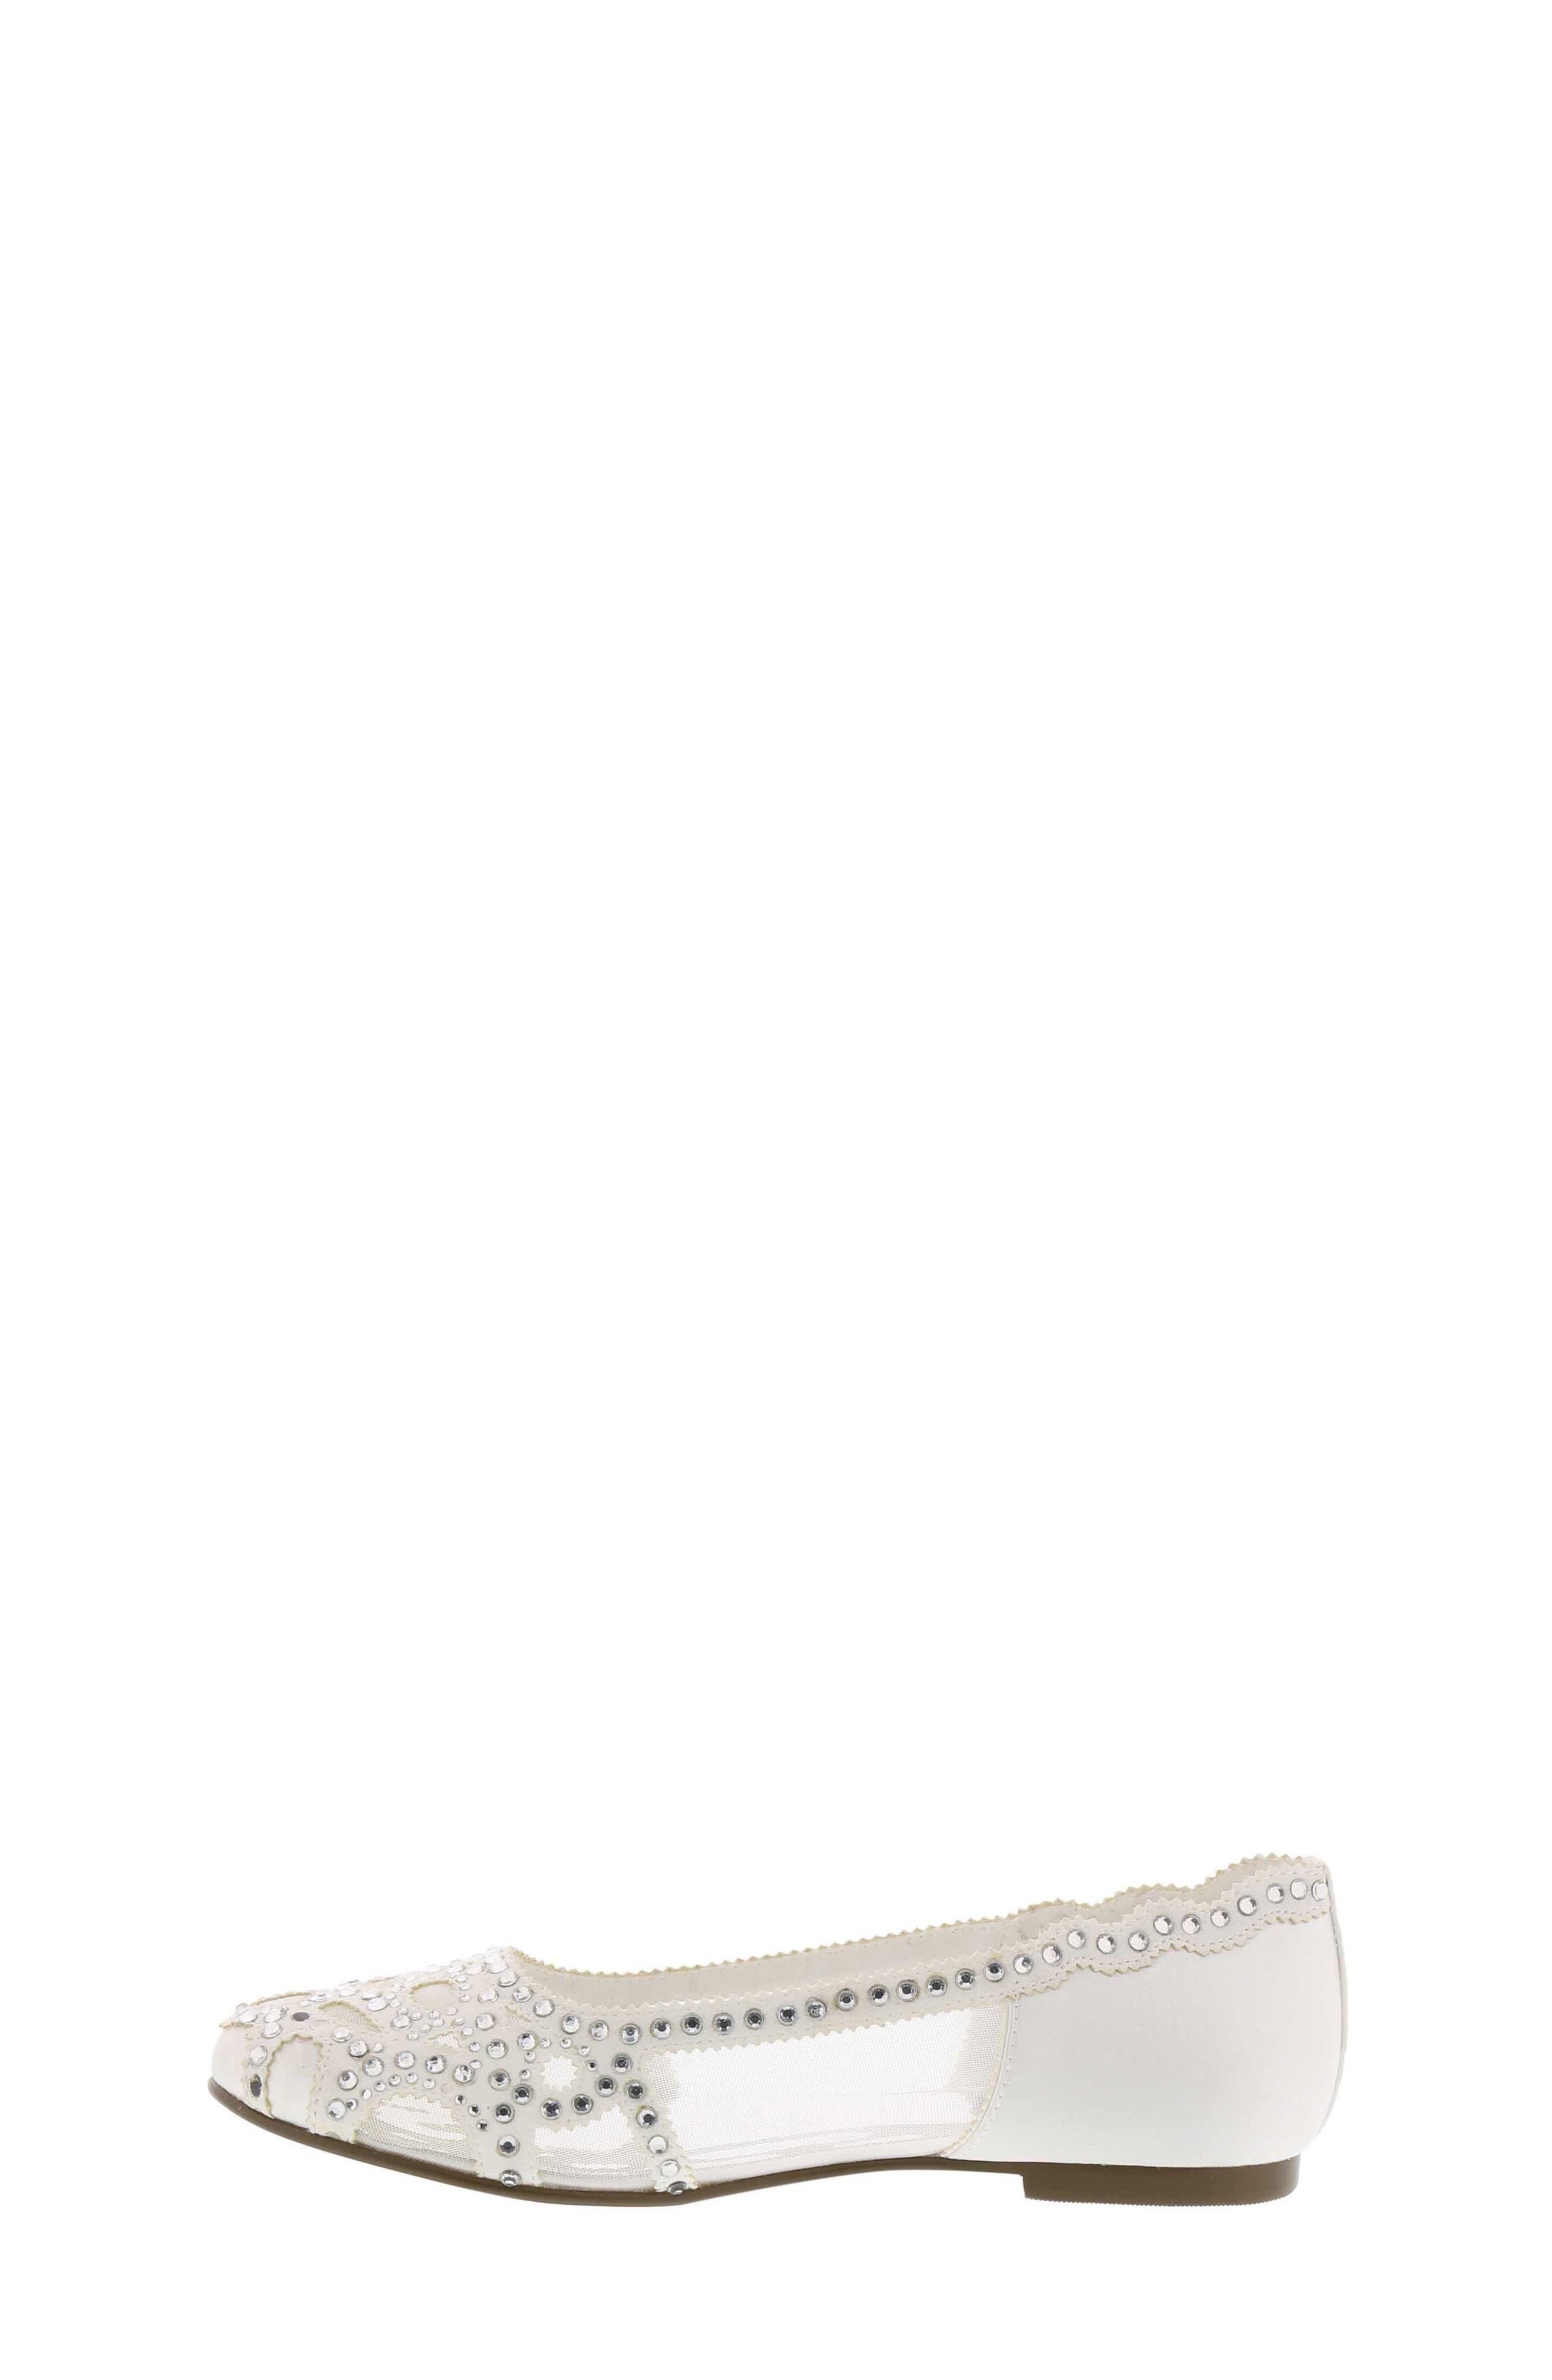 BADGLEY MISCHKA COLLECTION, Badgley Mischka Gigi Embellished Flat, Alternate thumbnail 2, color, WHITE